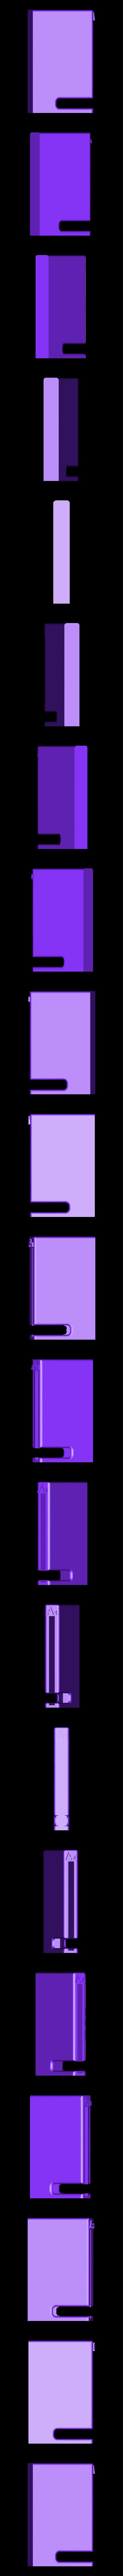 AAAA_holder.stl Download free STL file Battery Holder • Design to 3D print, milasls